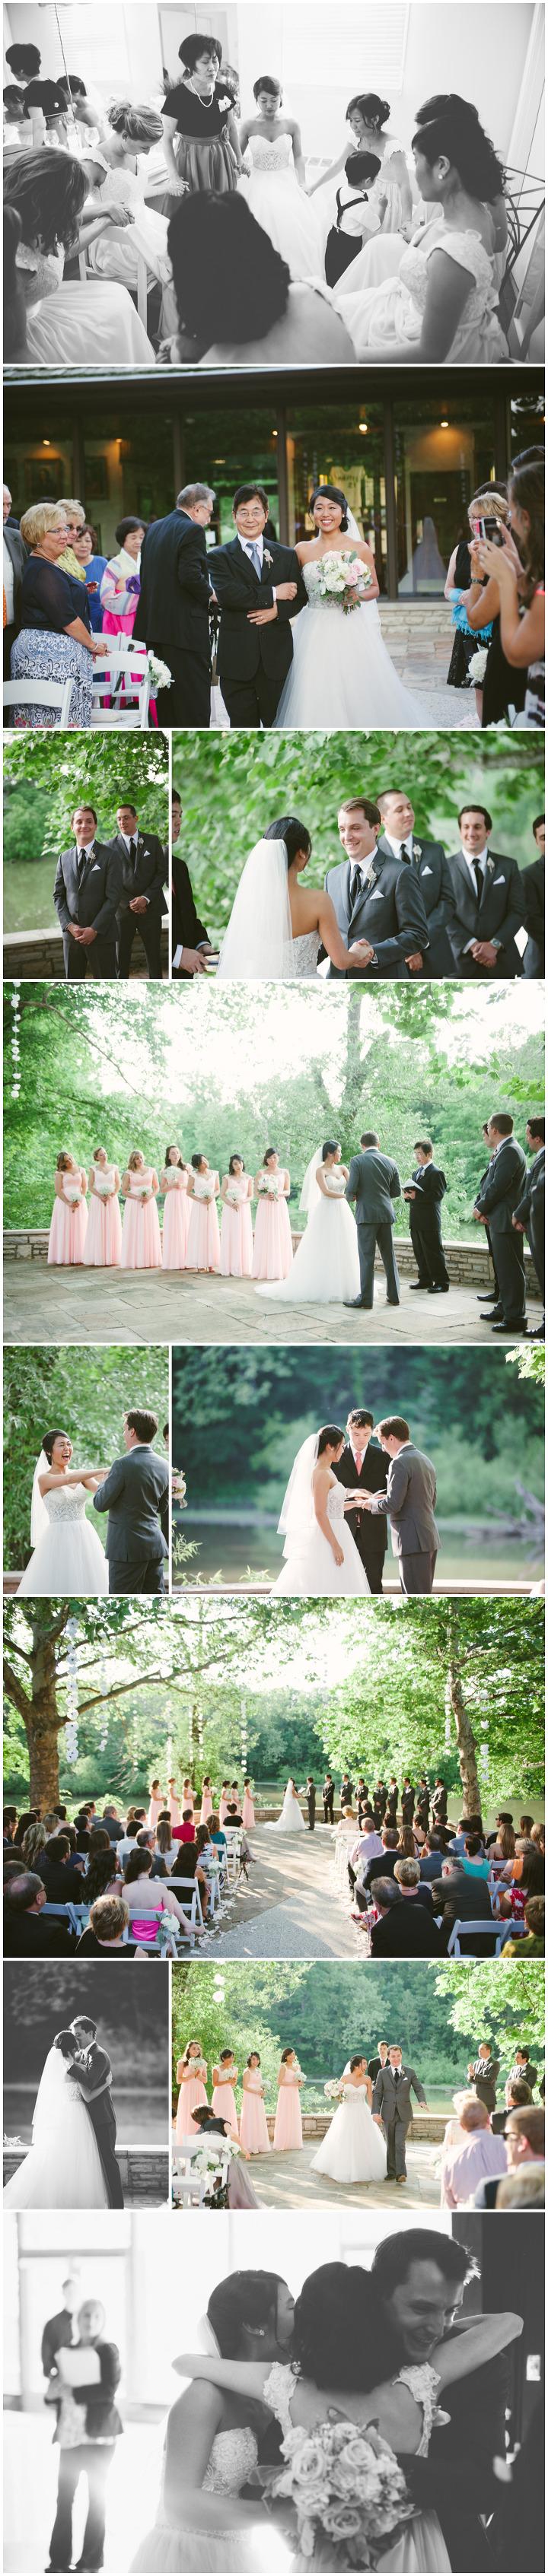 Blog Collage-Ruthie14